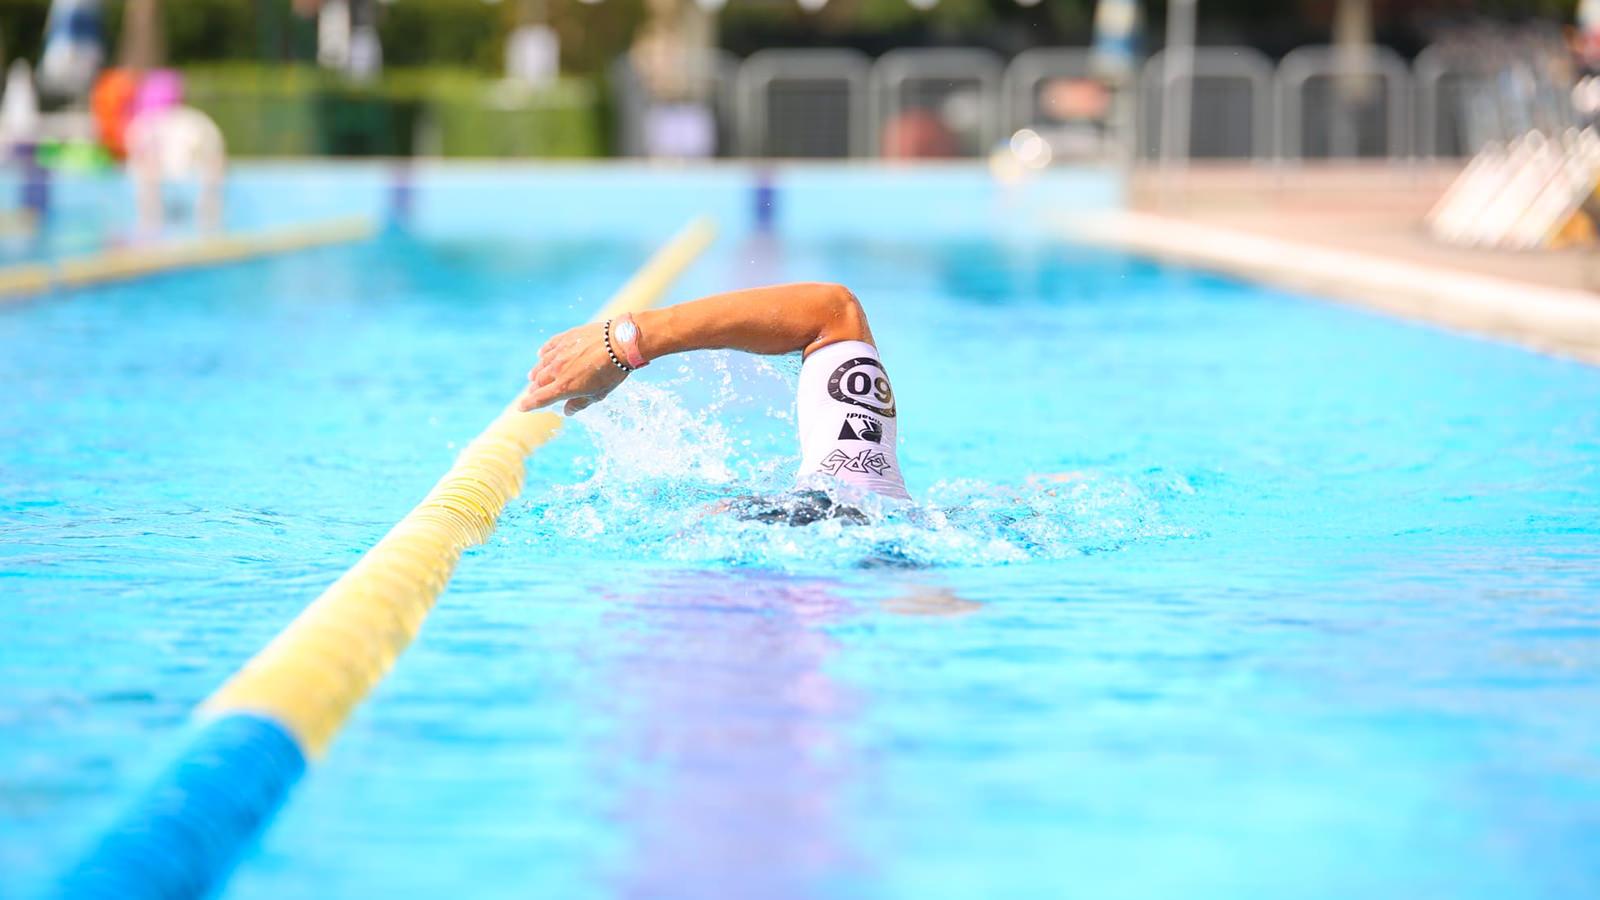 Team Triathlon 2021 - Nuoto